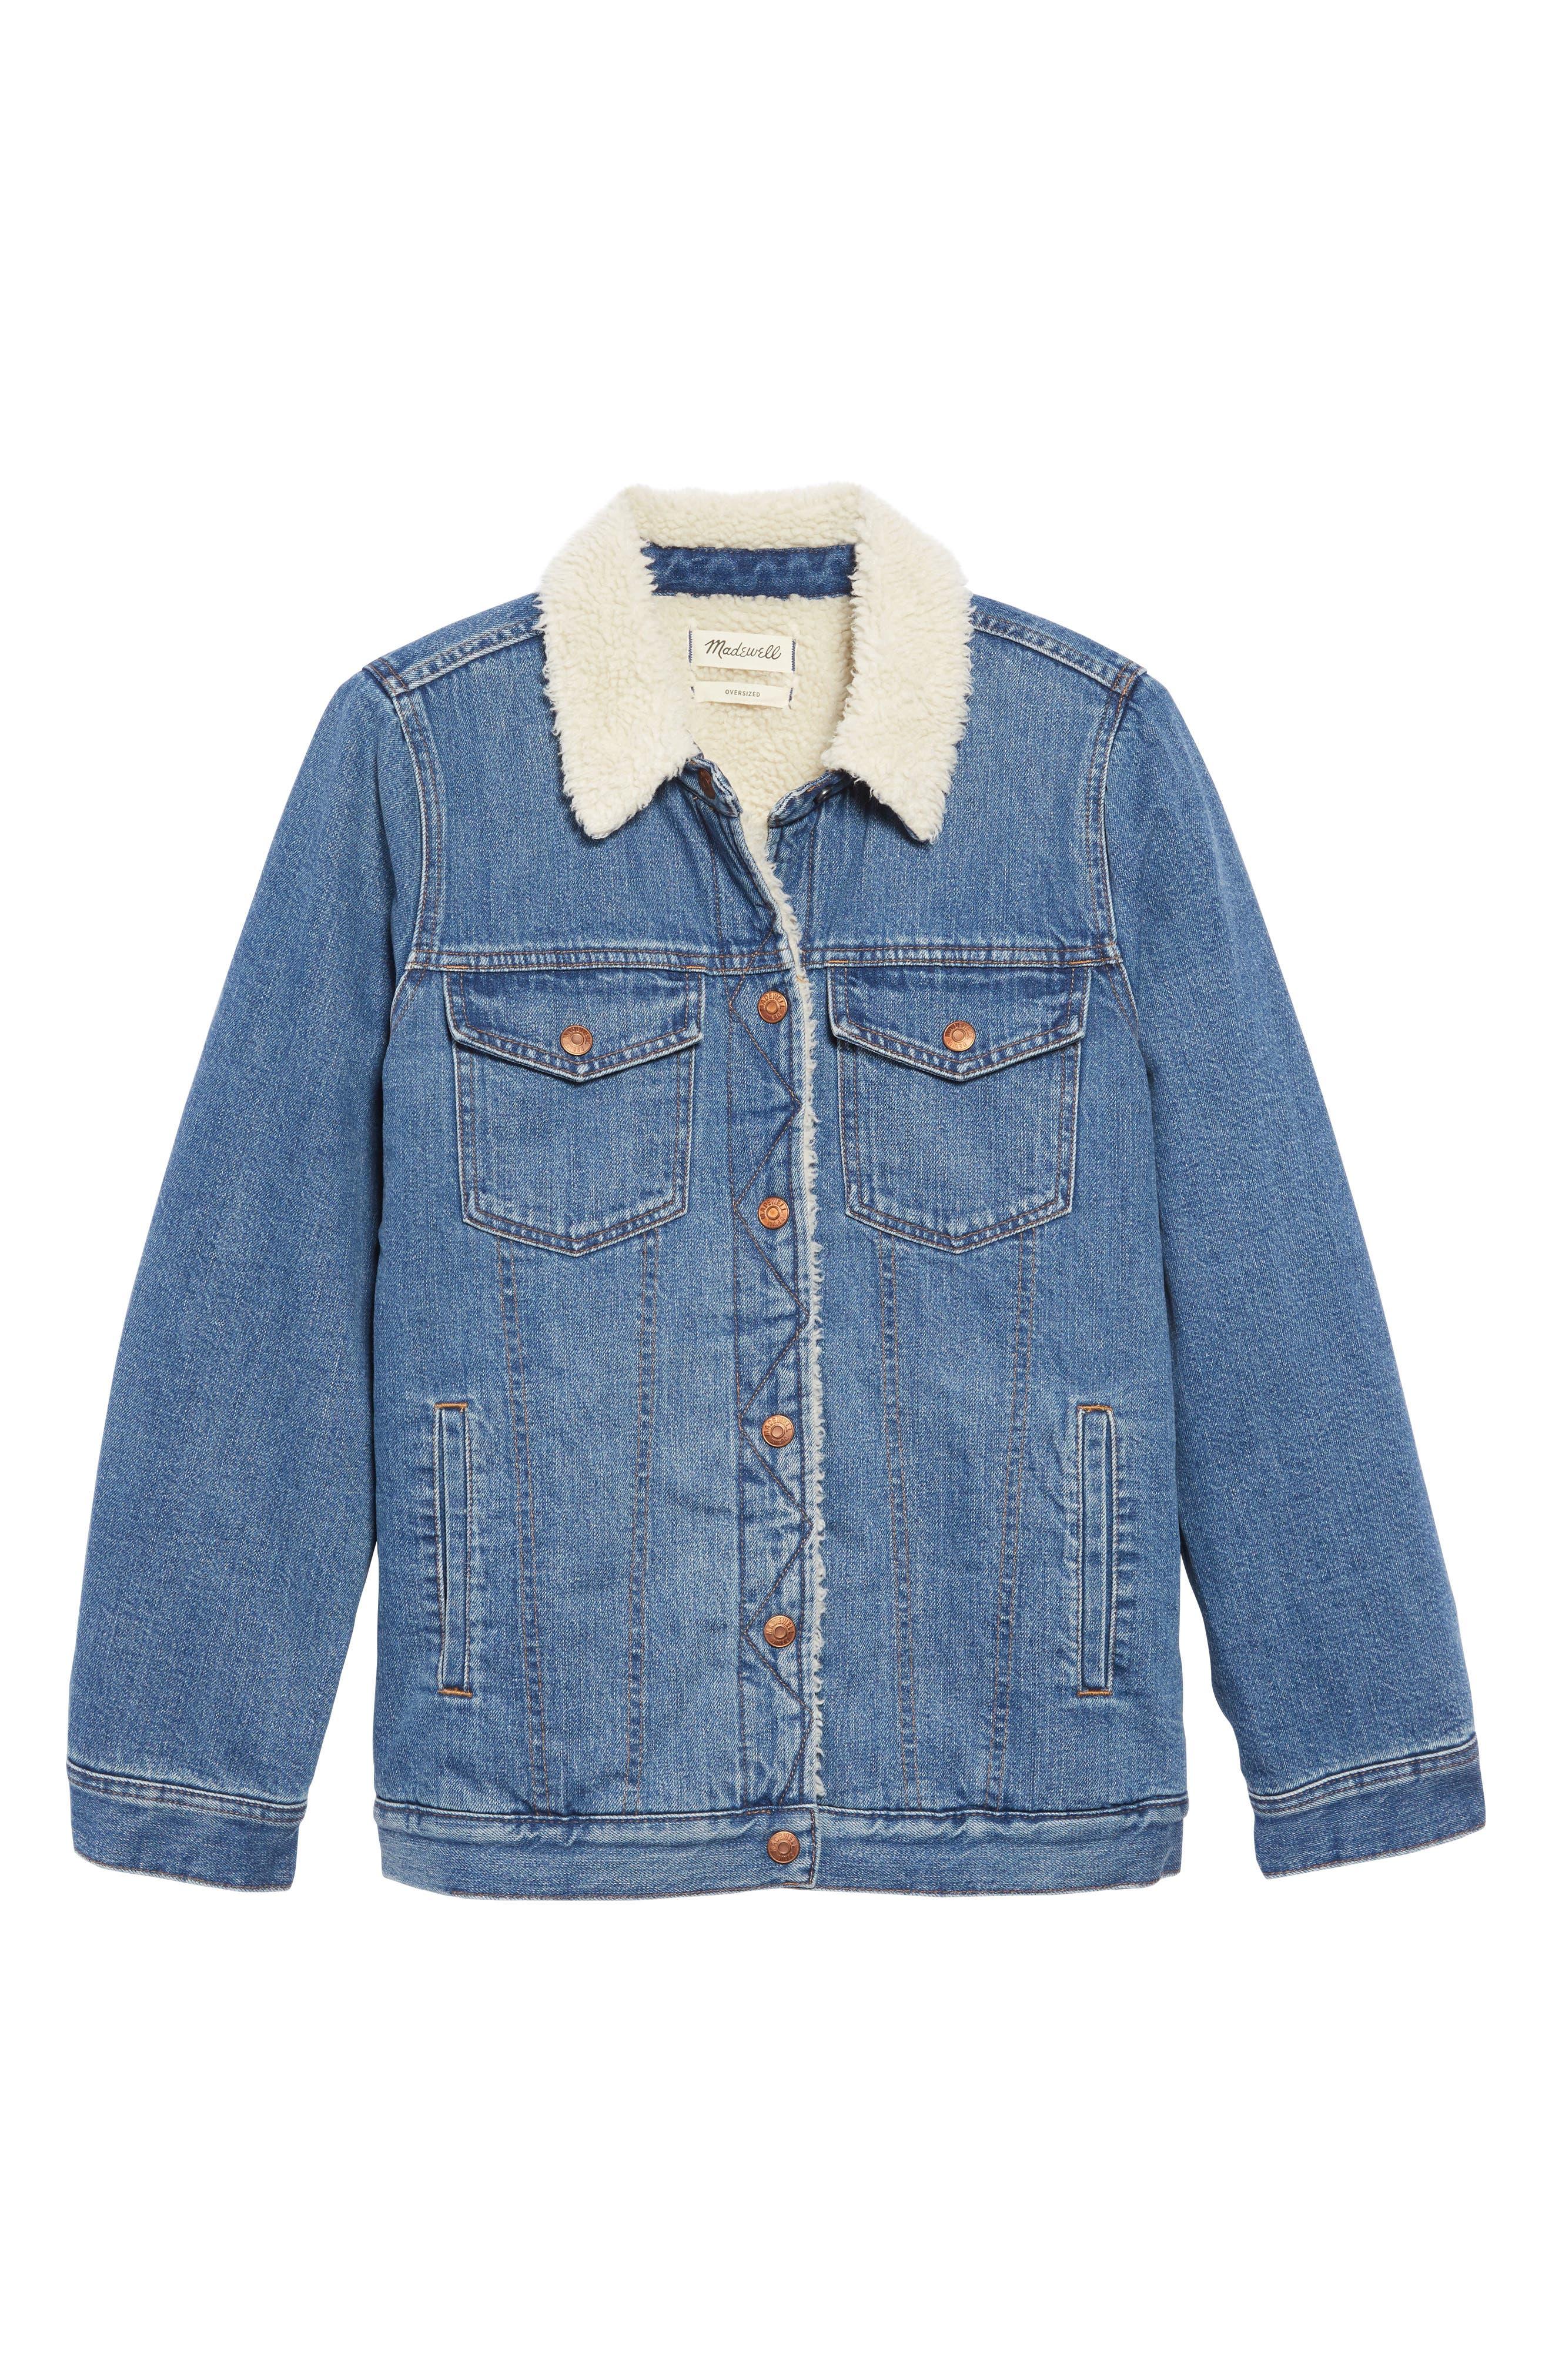 Madewell Coats Faux Shearling Trim Oversize Denim Jacket